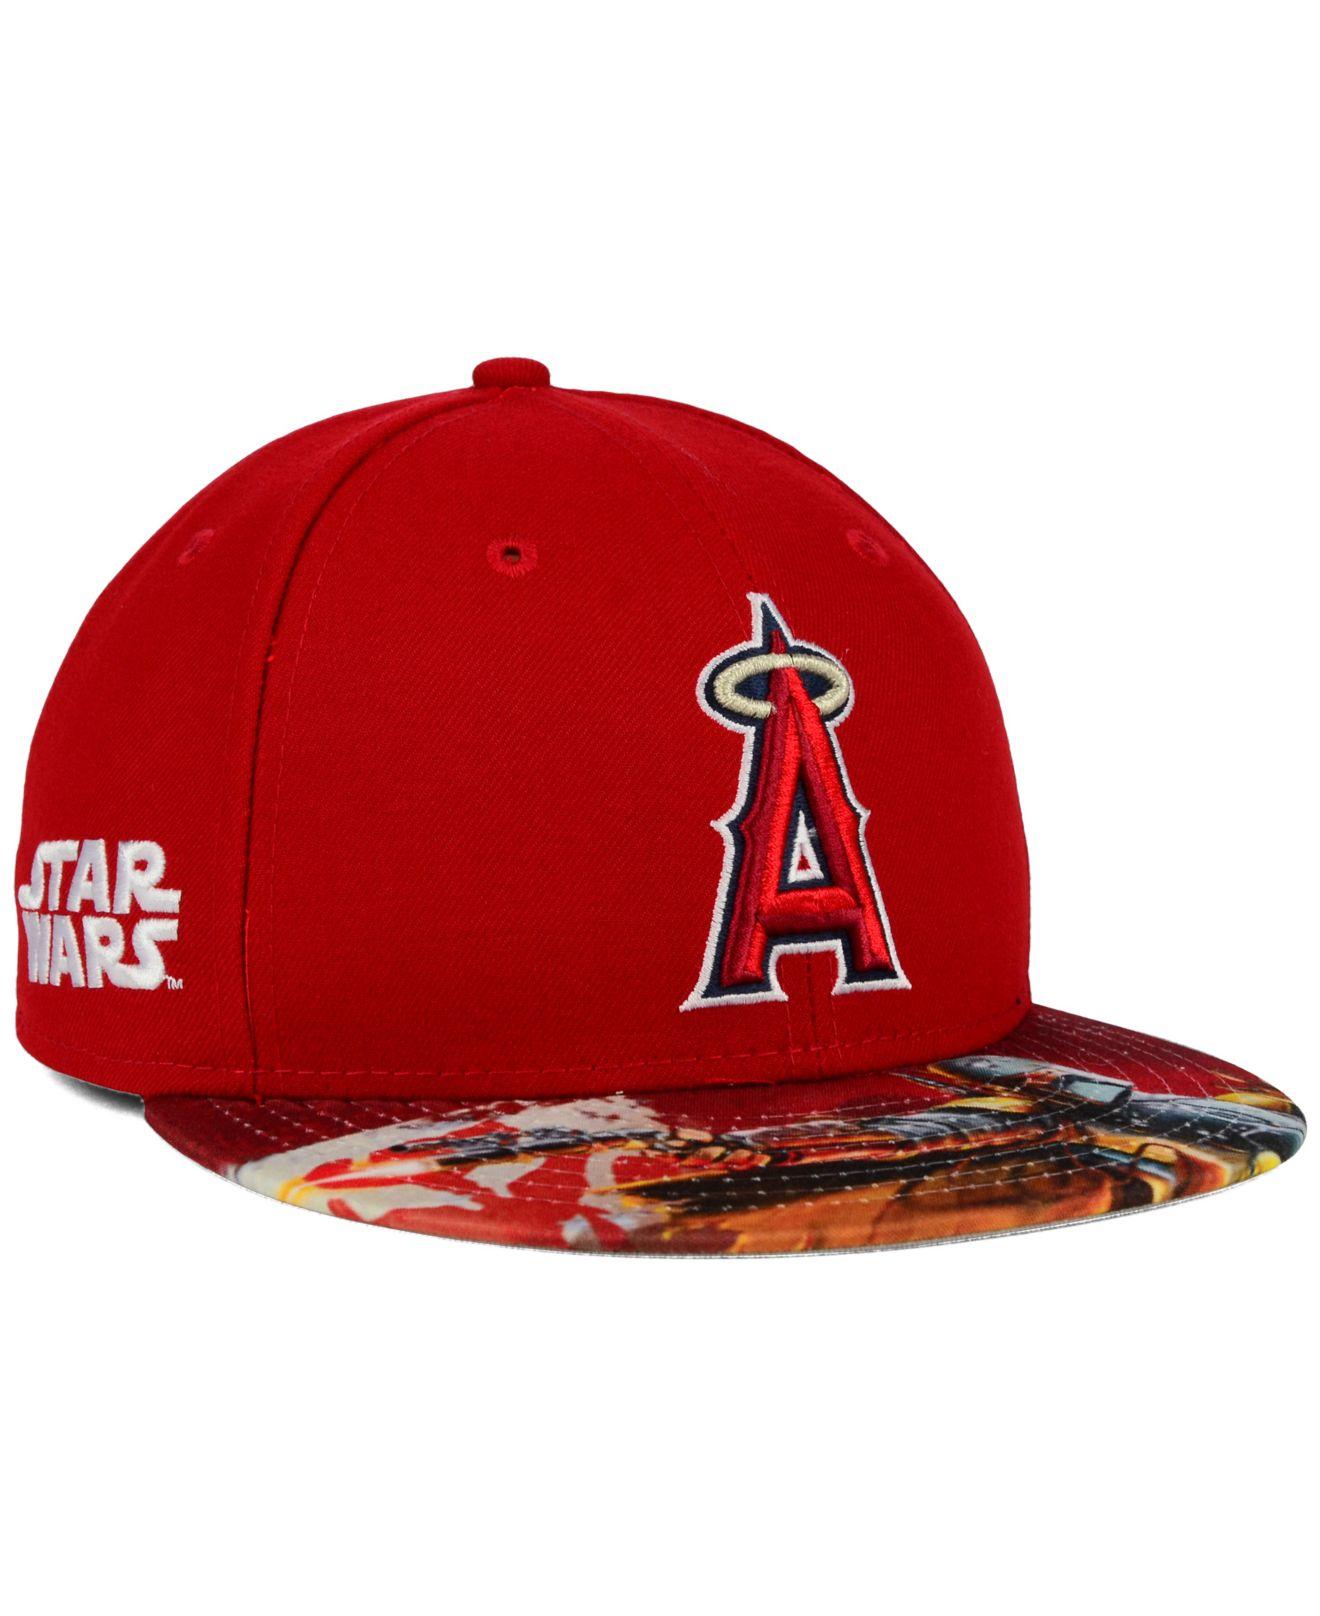 uk availability 5ae2e 9e374 KTZ Los Angeles Angels Of Anaheim Mlb X Star Wars Viza Print 59fifty ...